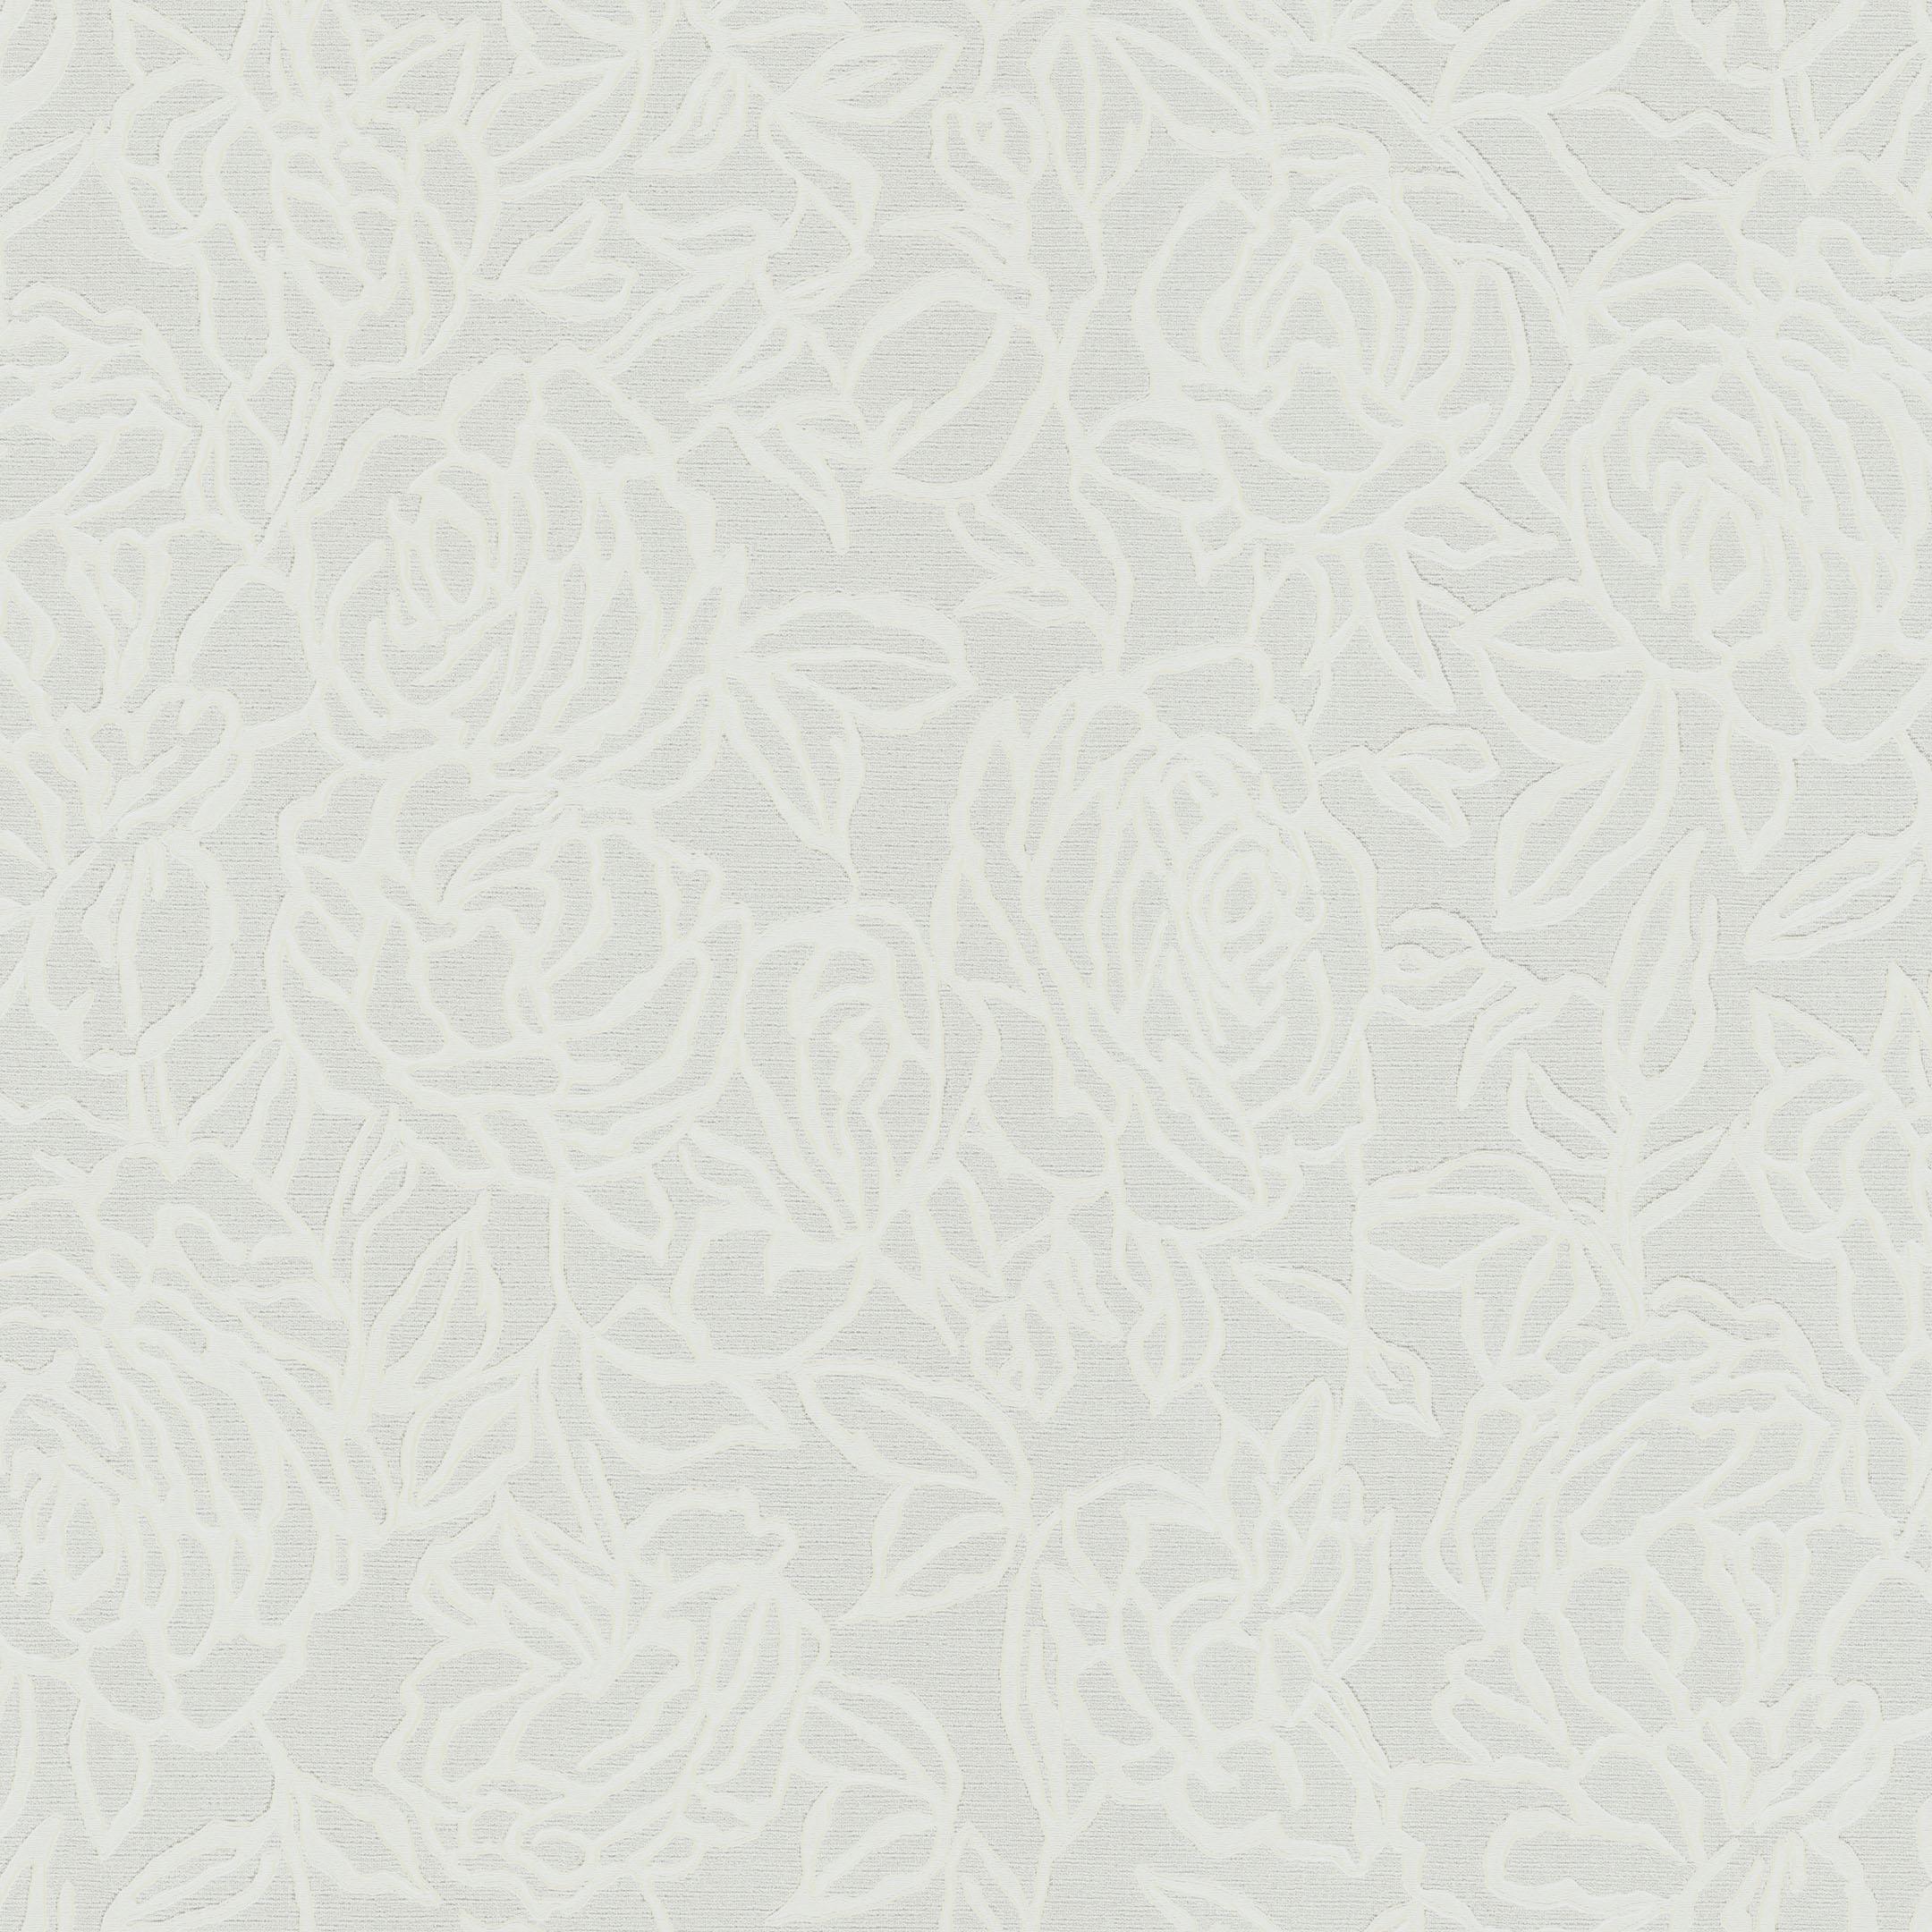 Обои виниловые на флизелиновой основе MaxWall Vila Rosa 59040-20 (1,06х10 м) r1 221 обои loymina rosa dragomirski